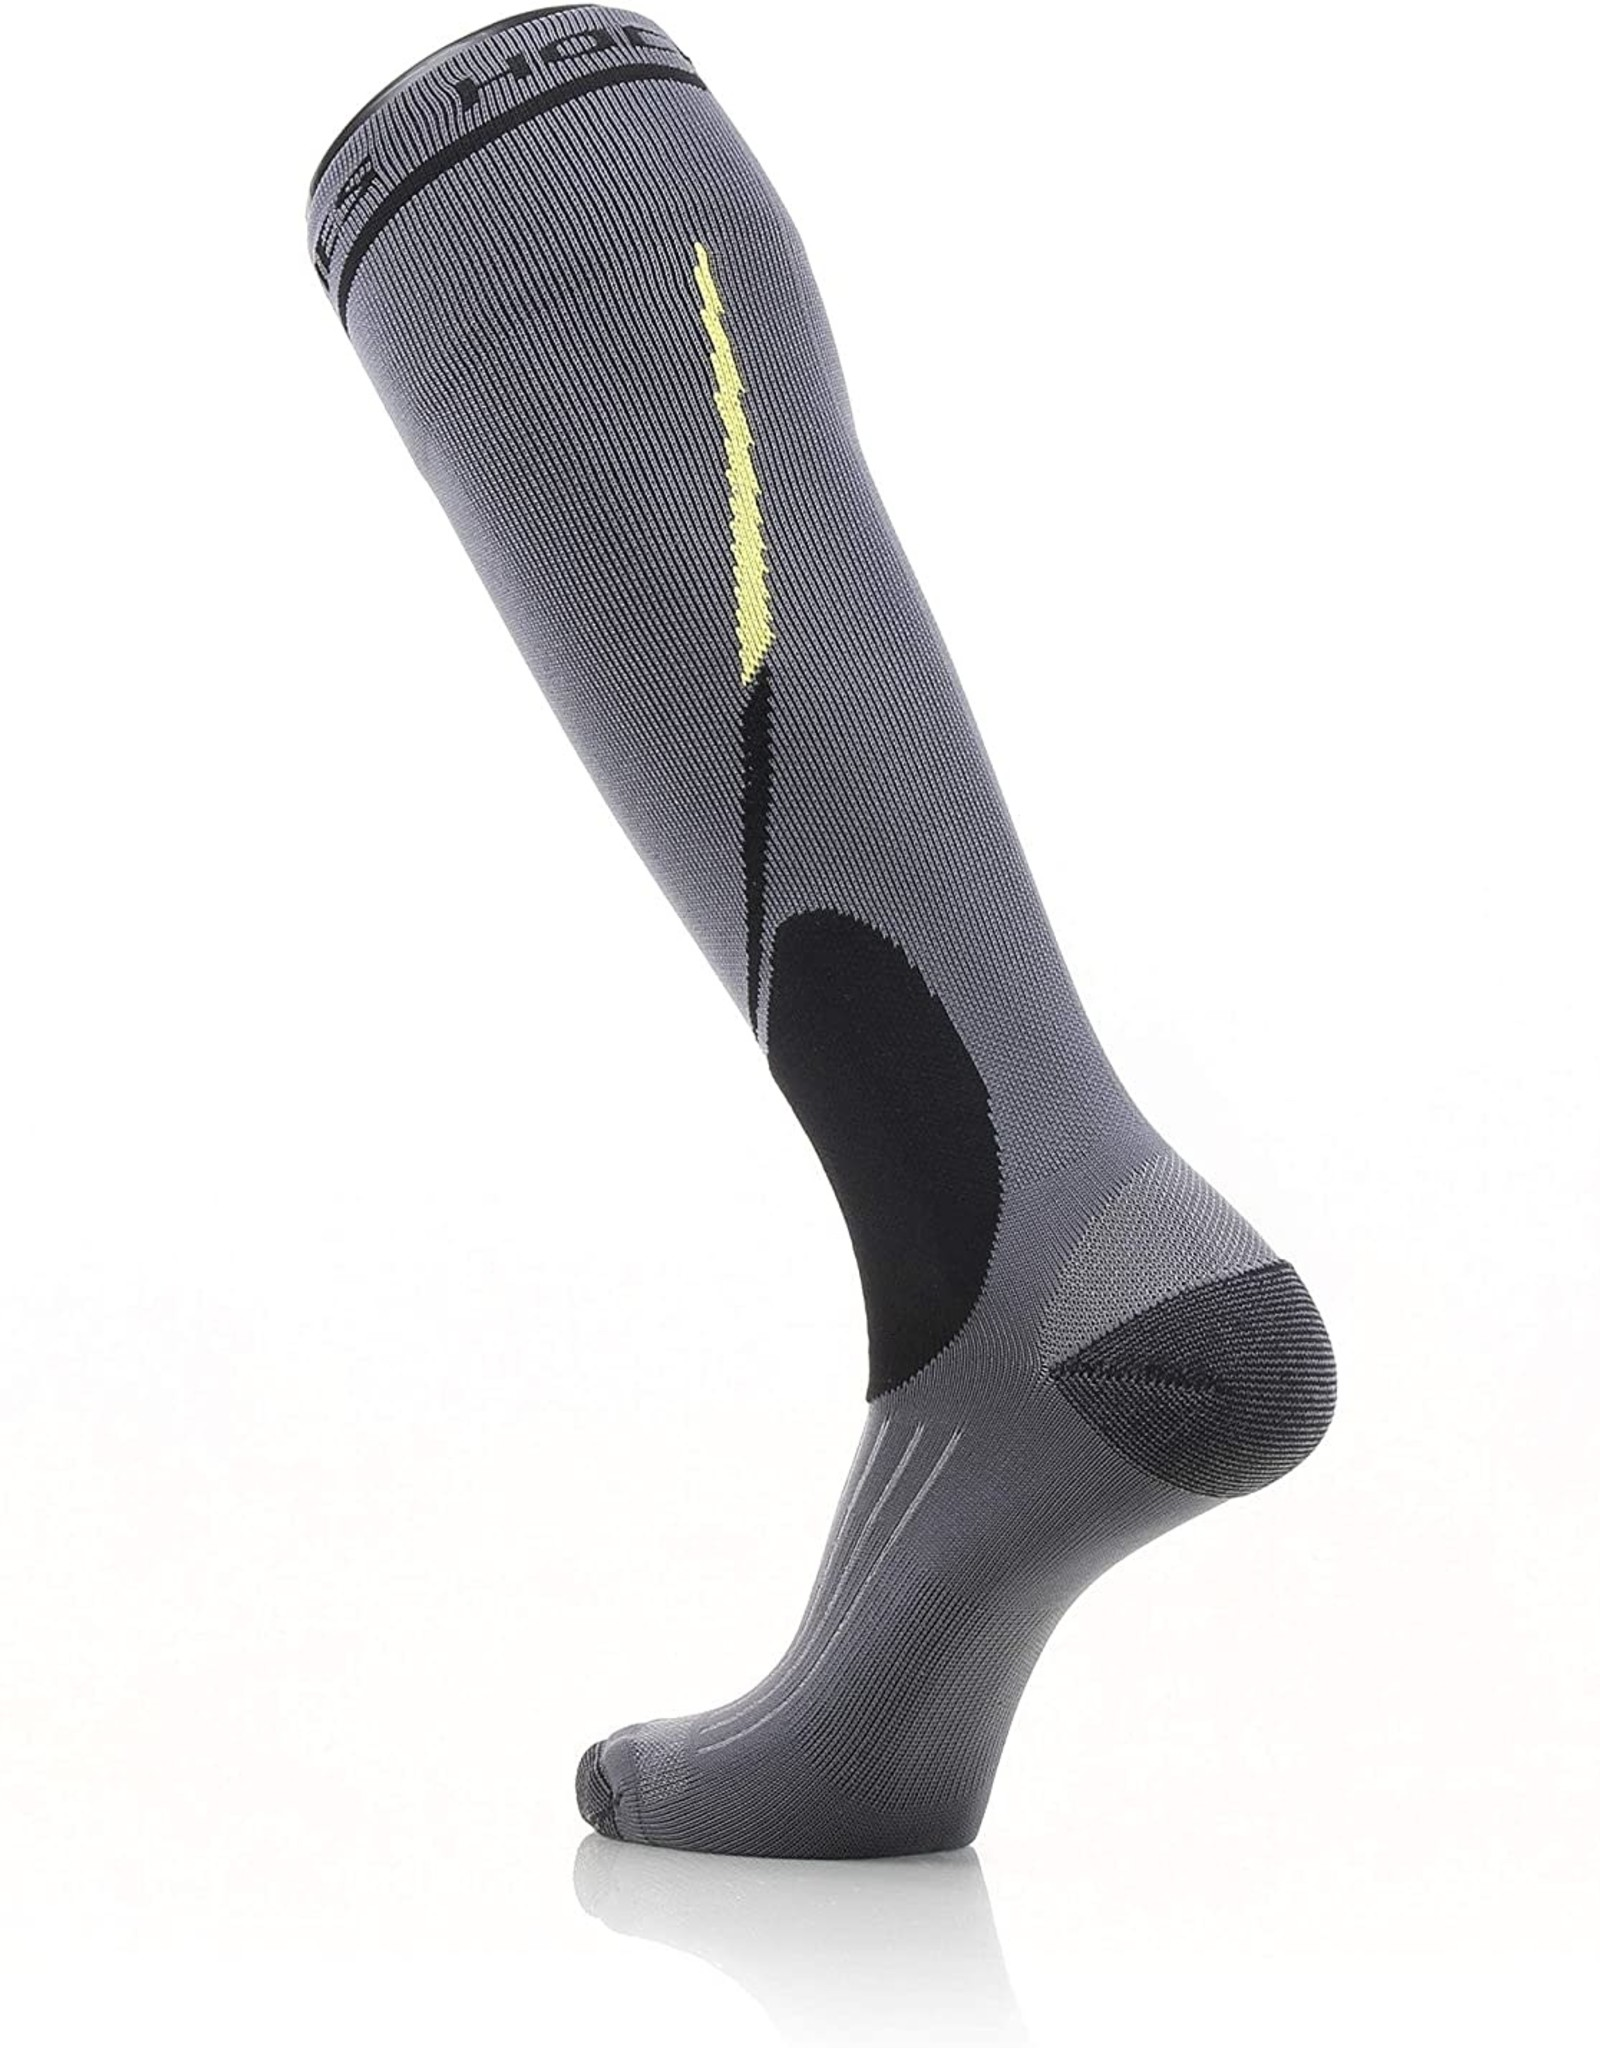 Howies Howies Pro Style Skate Sock